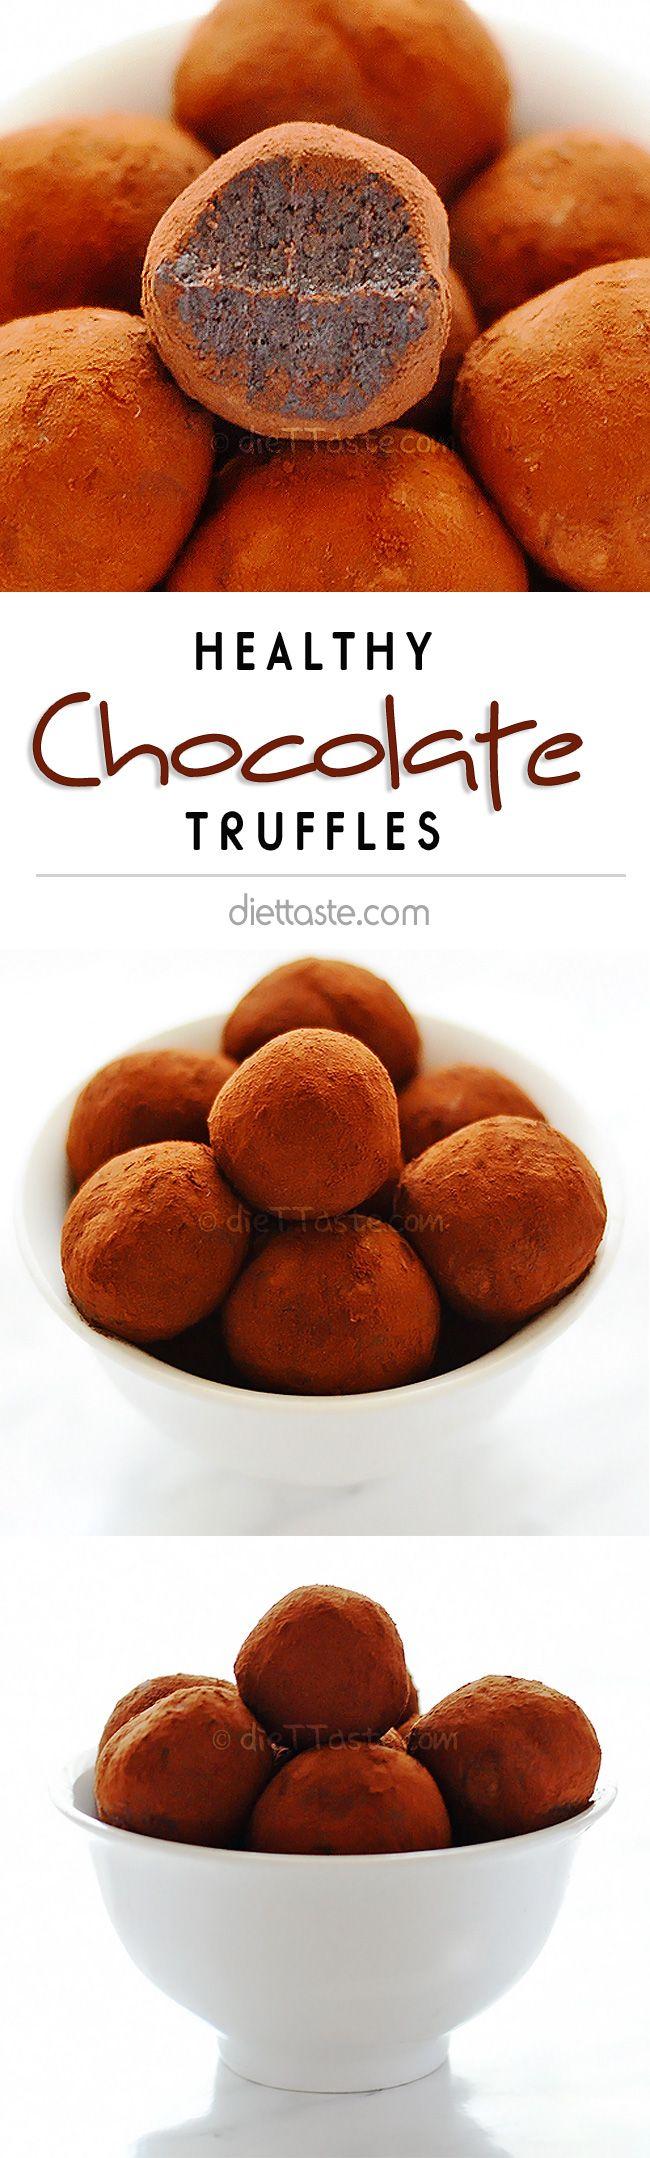 Healthy Chocolate Truffles - super easy dessert, ready in 1 minute - diettaste.com